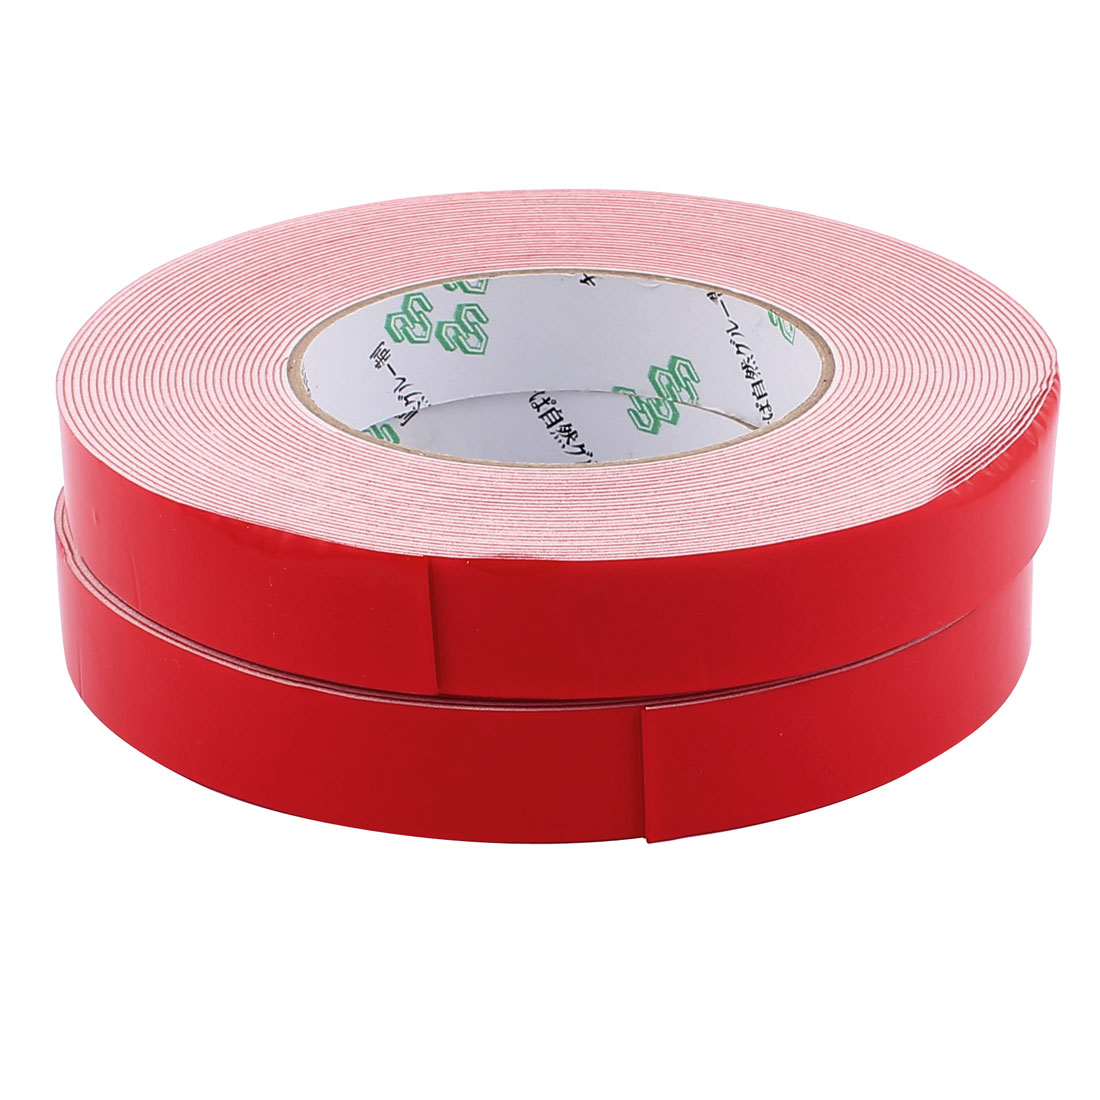 2 Pcs 20mmx1mm Double Sided Sponge Tape Adhesive Sticker Foam Glue Strip Sealing 10 Meters 33Ft